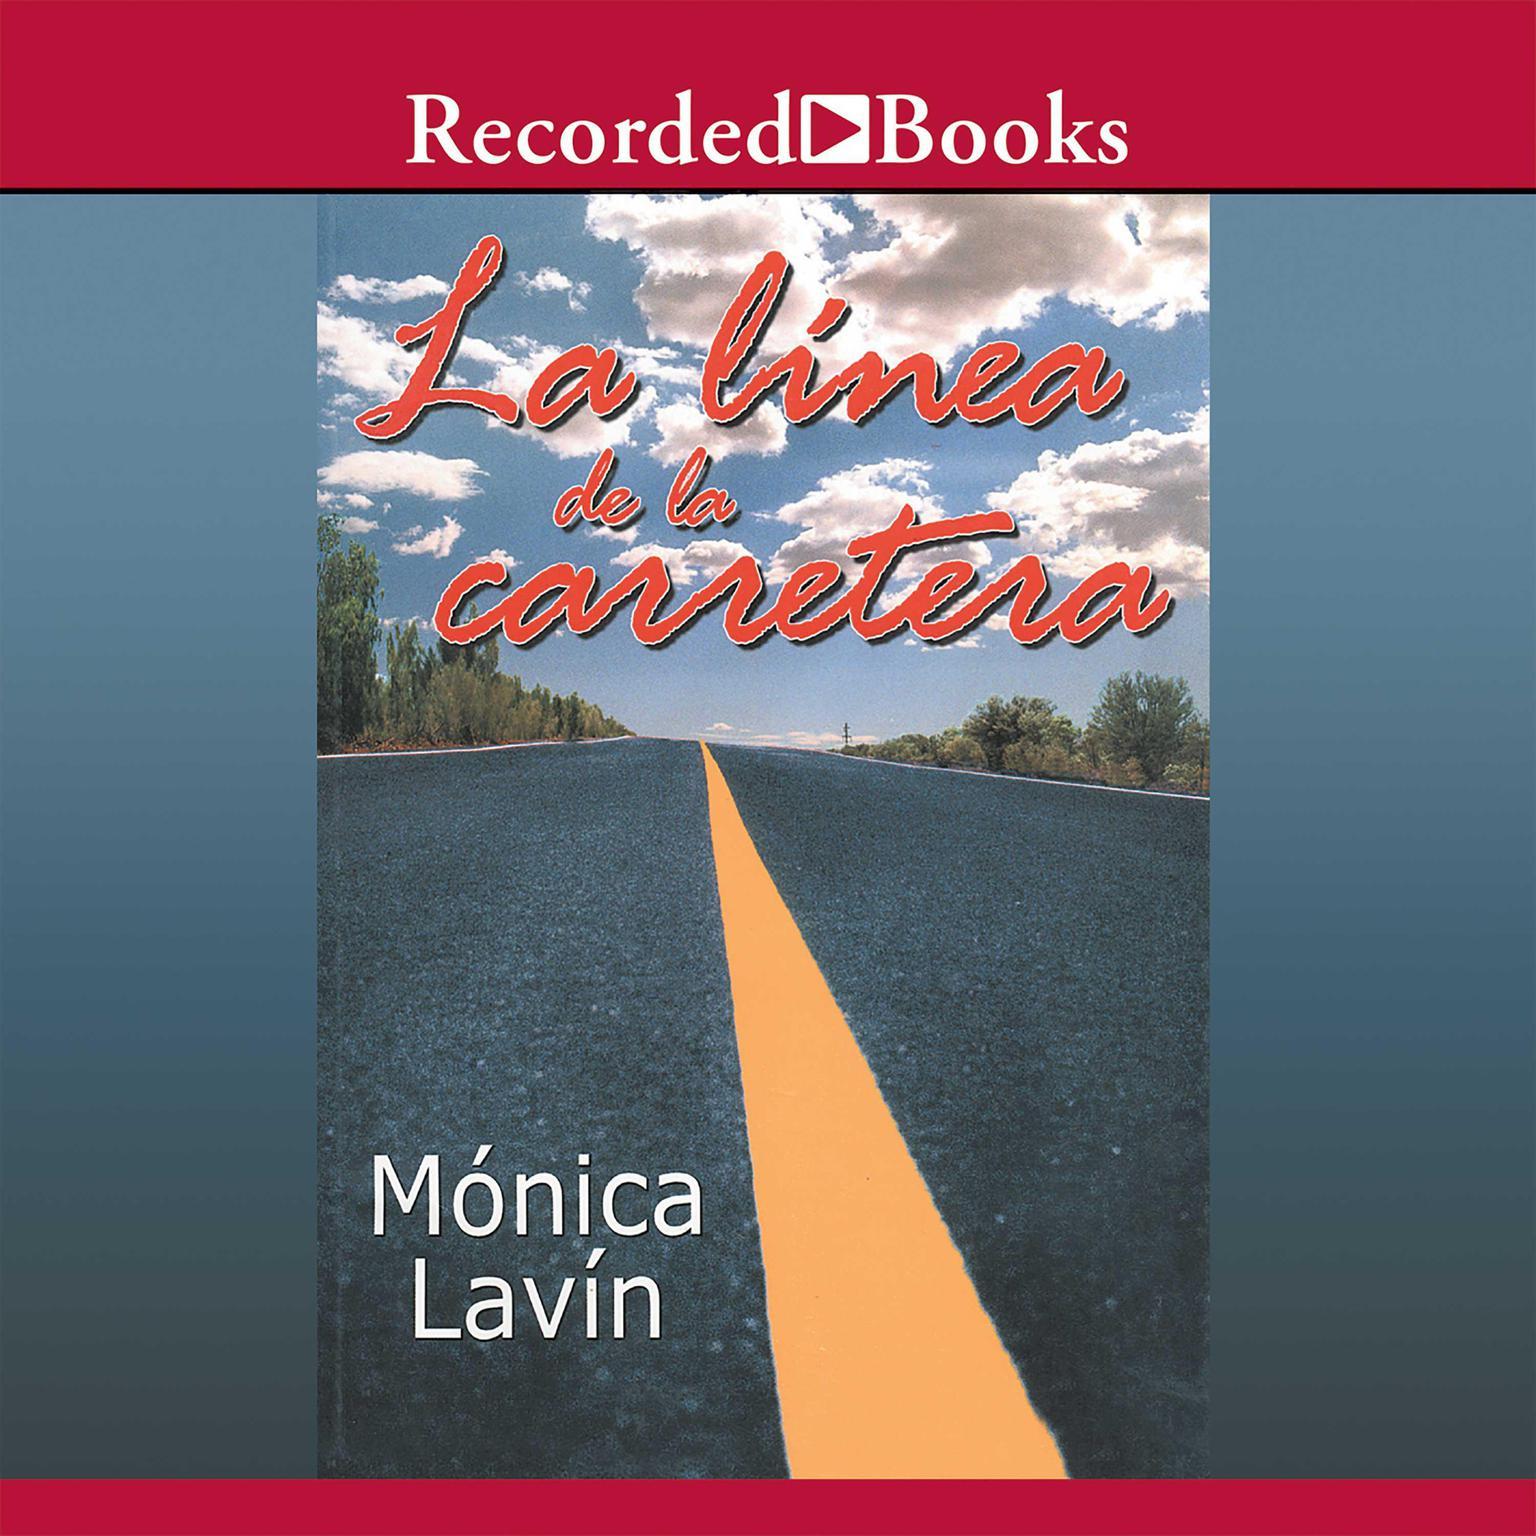 La Linea de la Carretera (The Highway Line) Audiobook, by Mónica Lavín